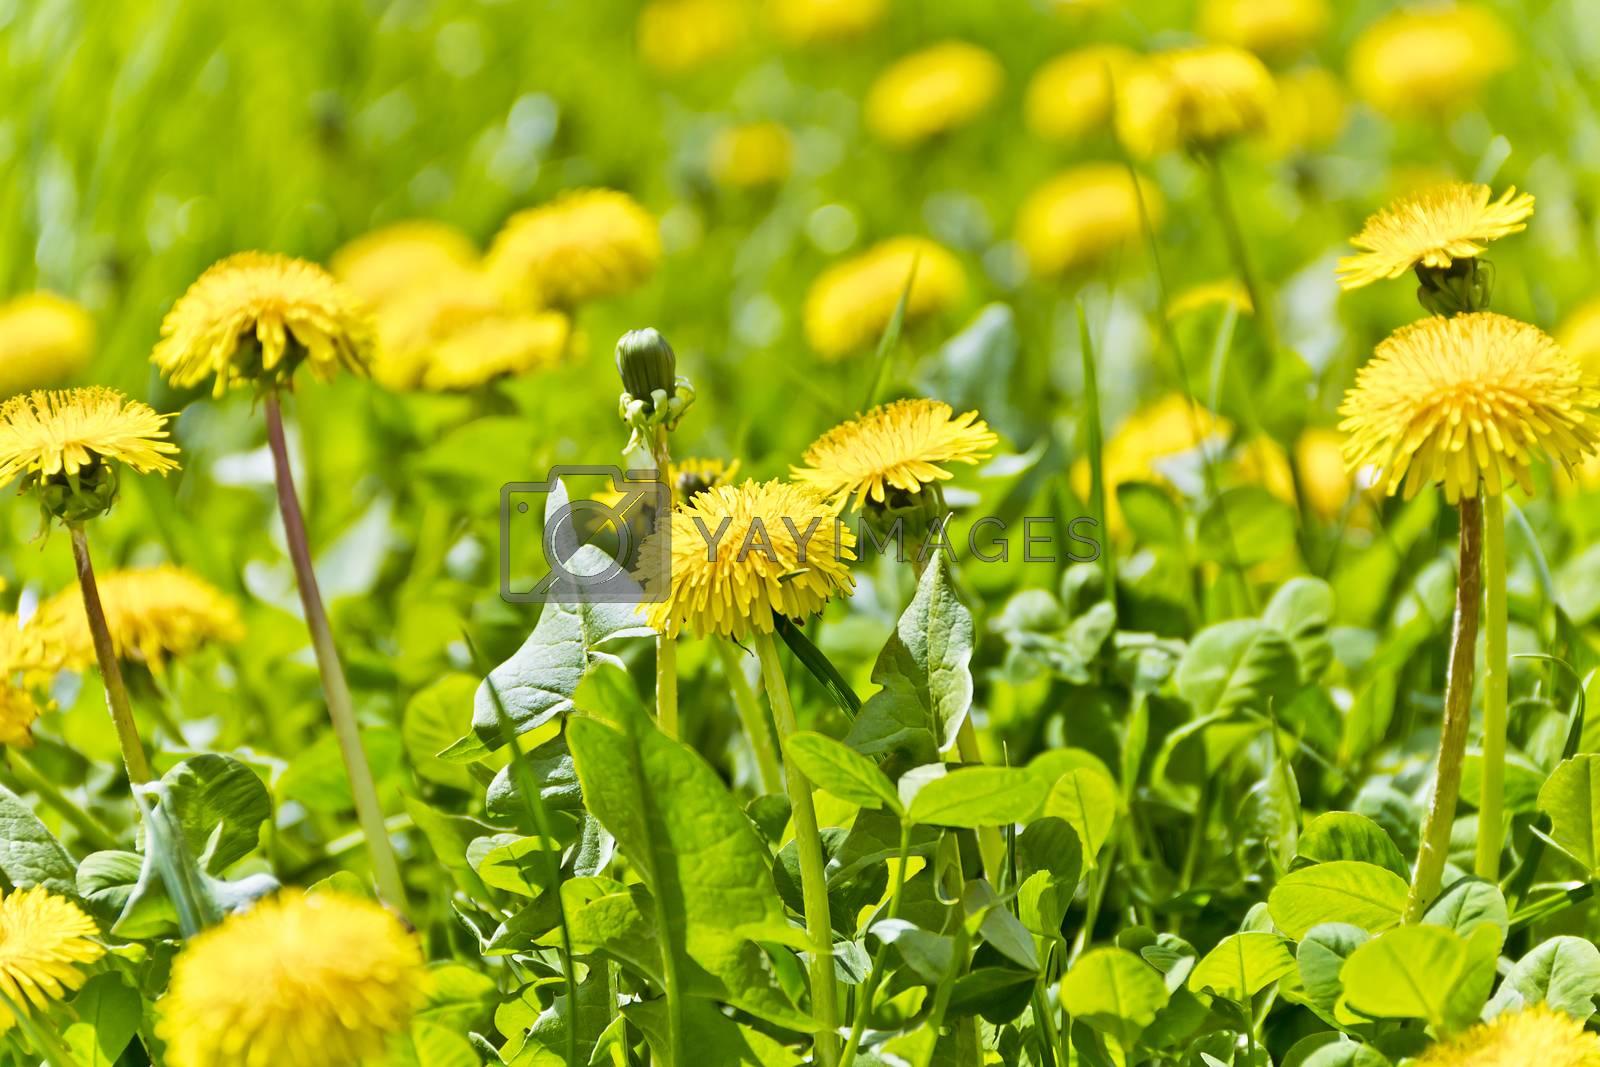 Summer meadow in sun light with yelow dandelions